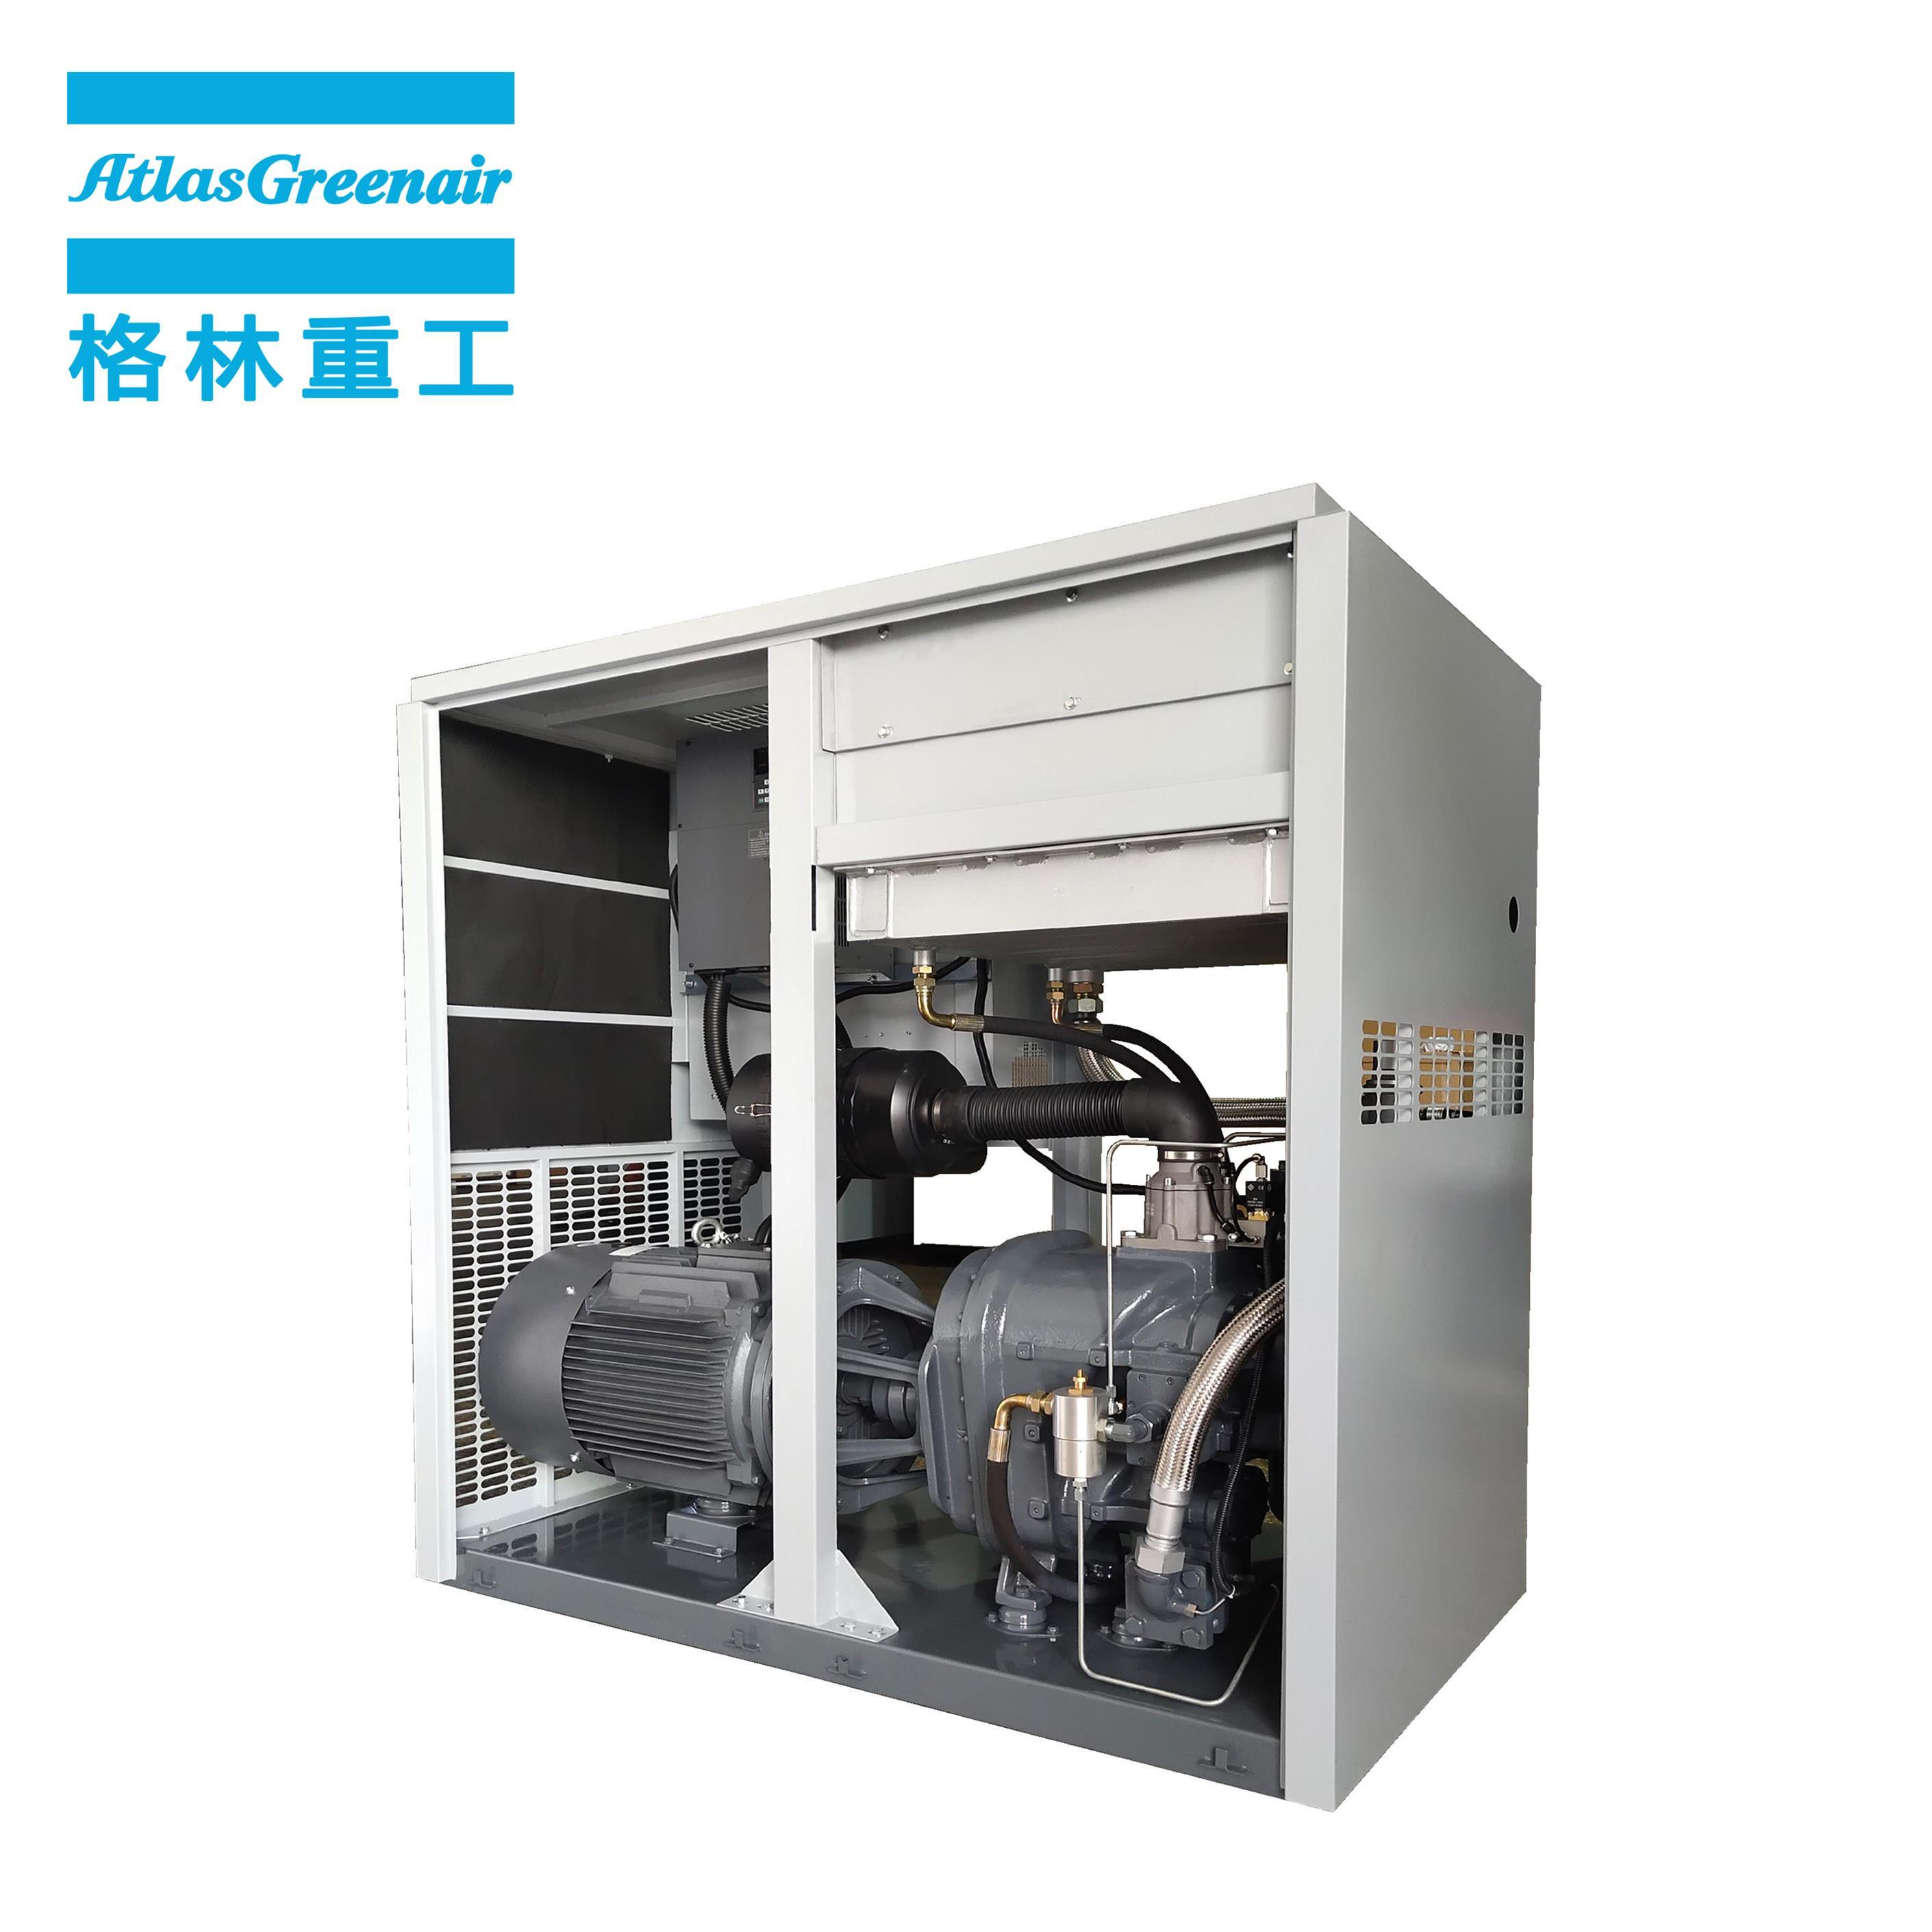 Atlas Greenair Screw Air Compressor vsd compressor atlas copco with four pole motor customization-2